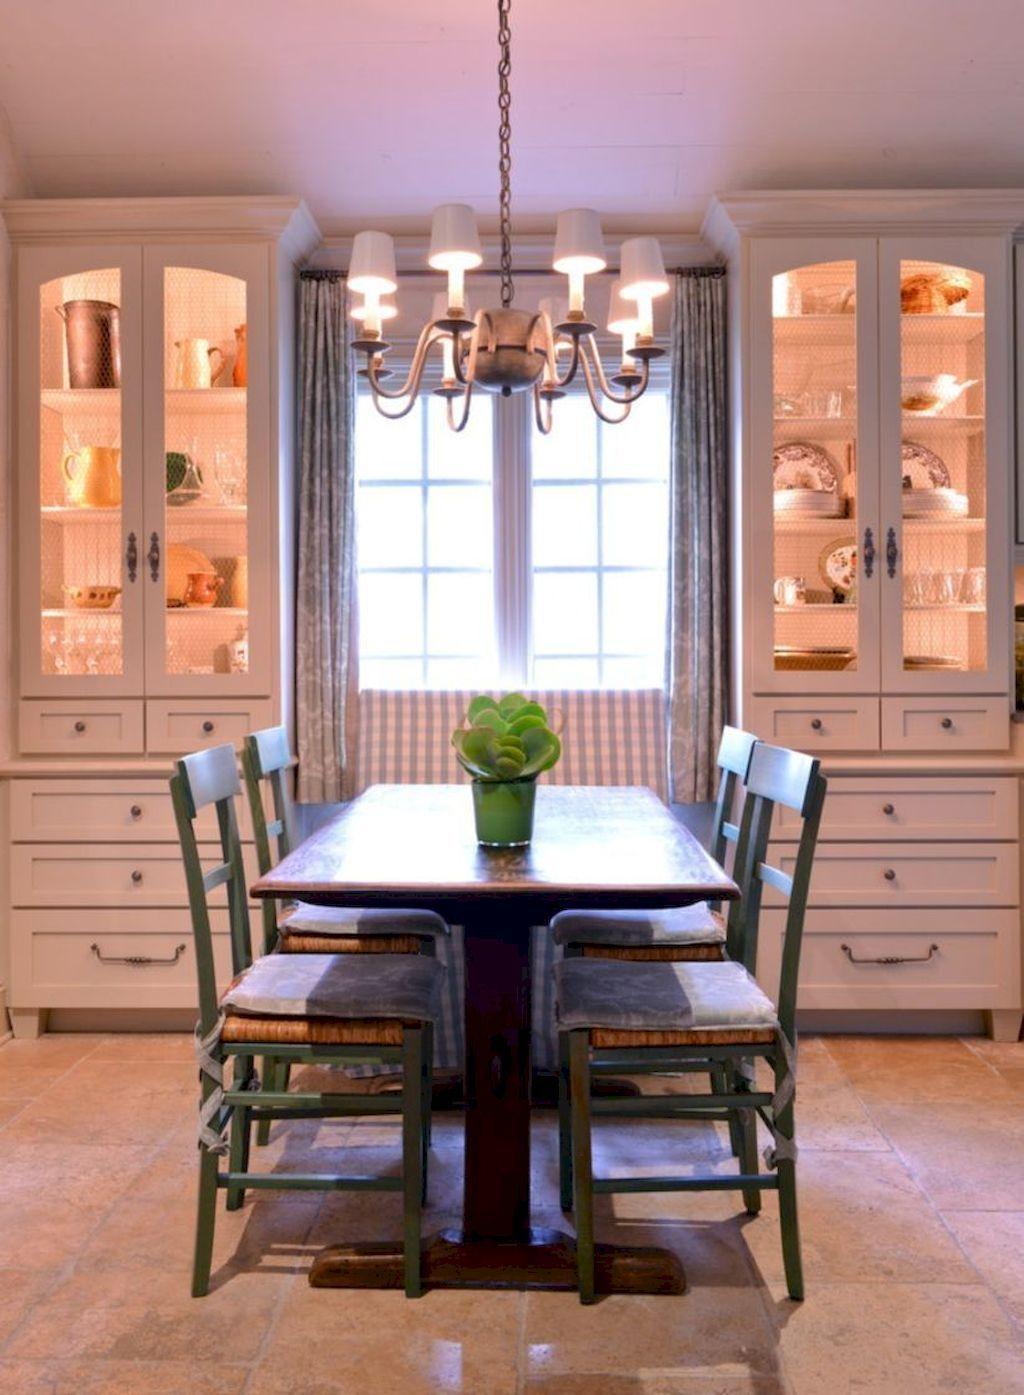 abid abdullah | Corner cabinet dining room, Dining room ...